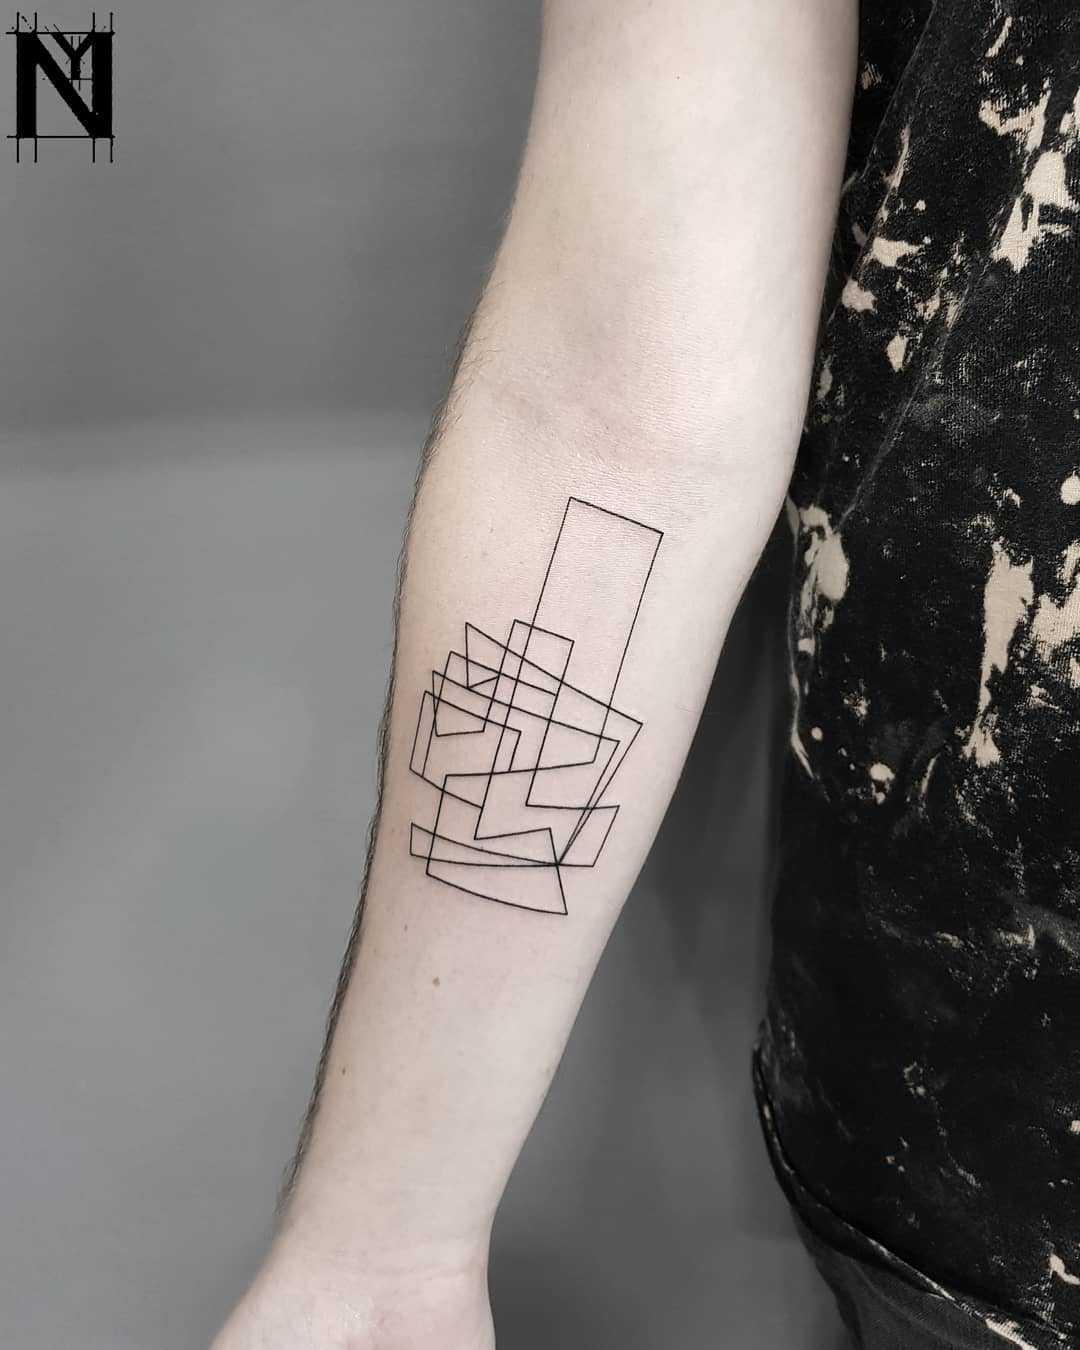 Tattoo based on John Mclaughlins